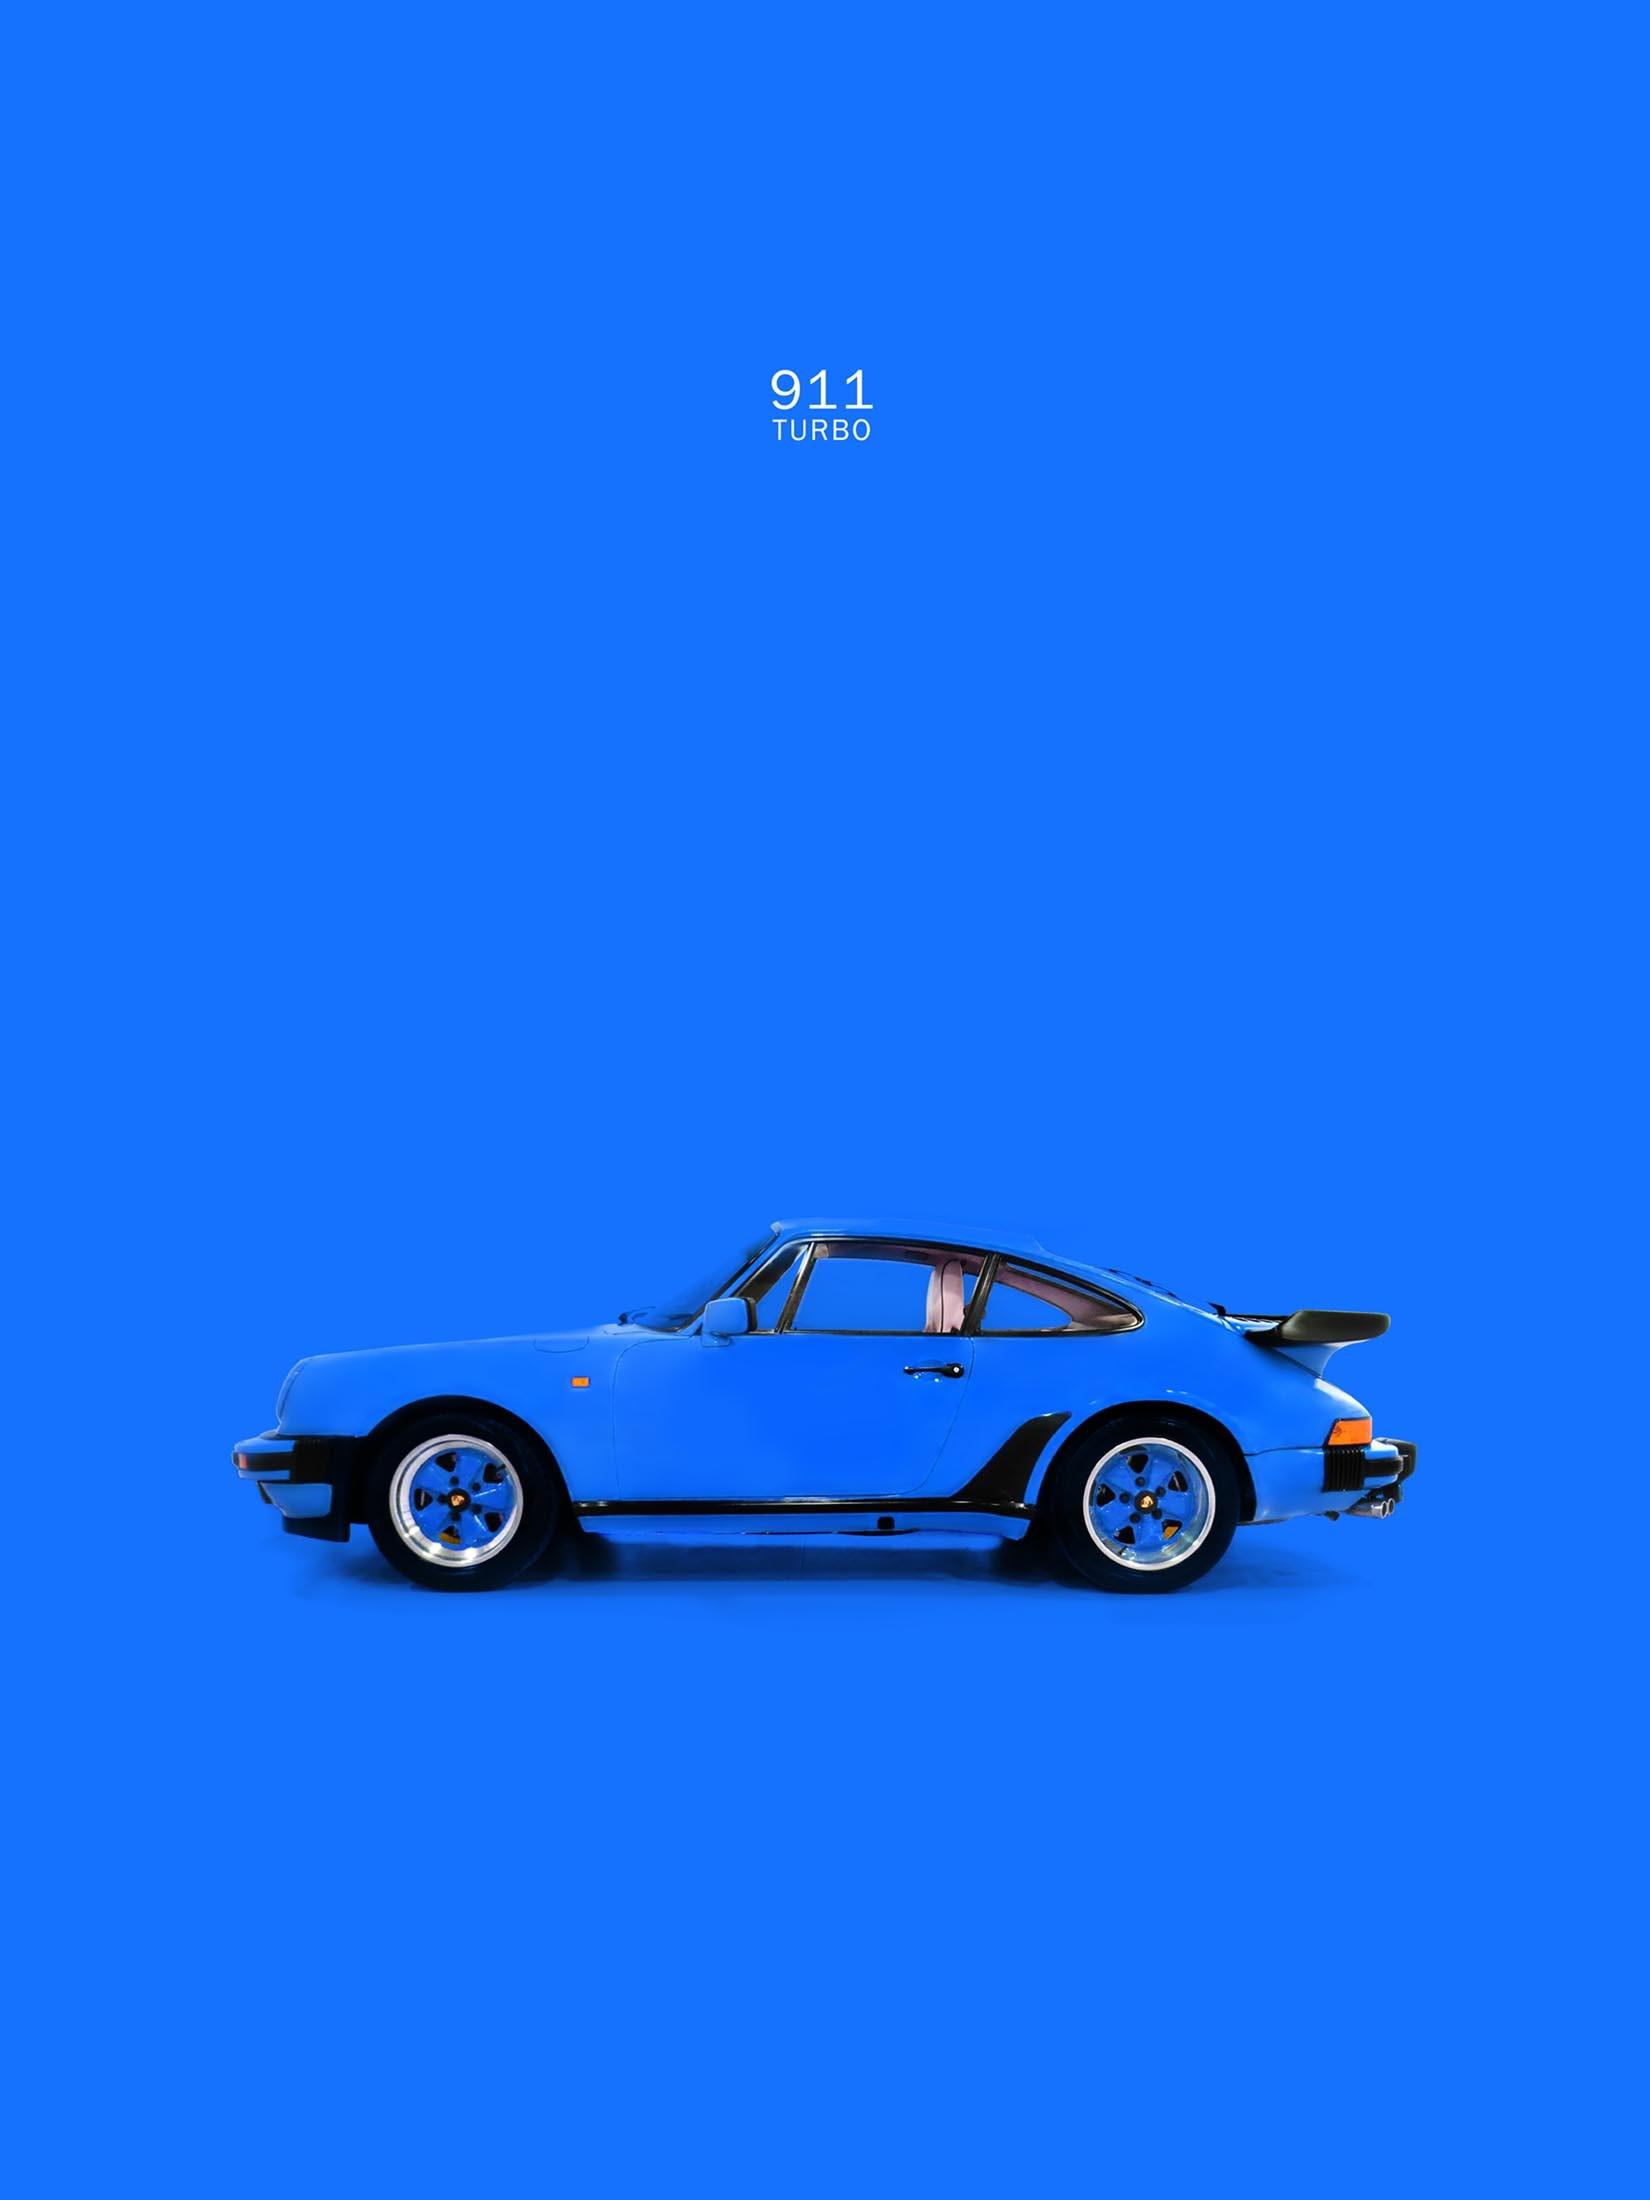 911 Turbo - Blue